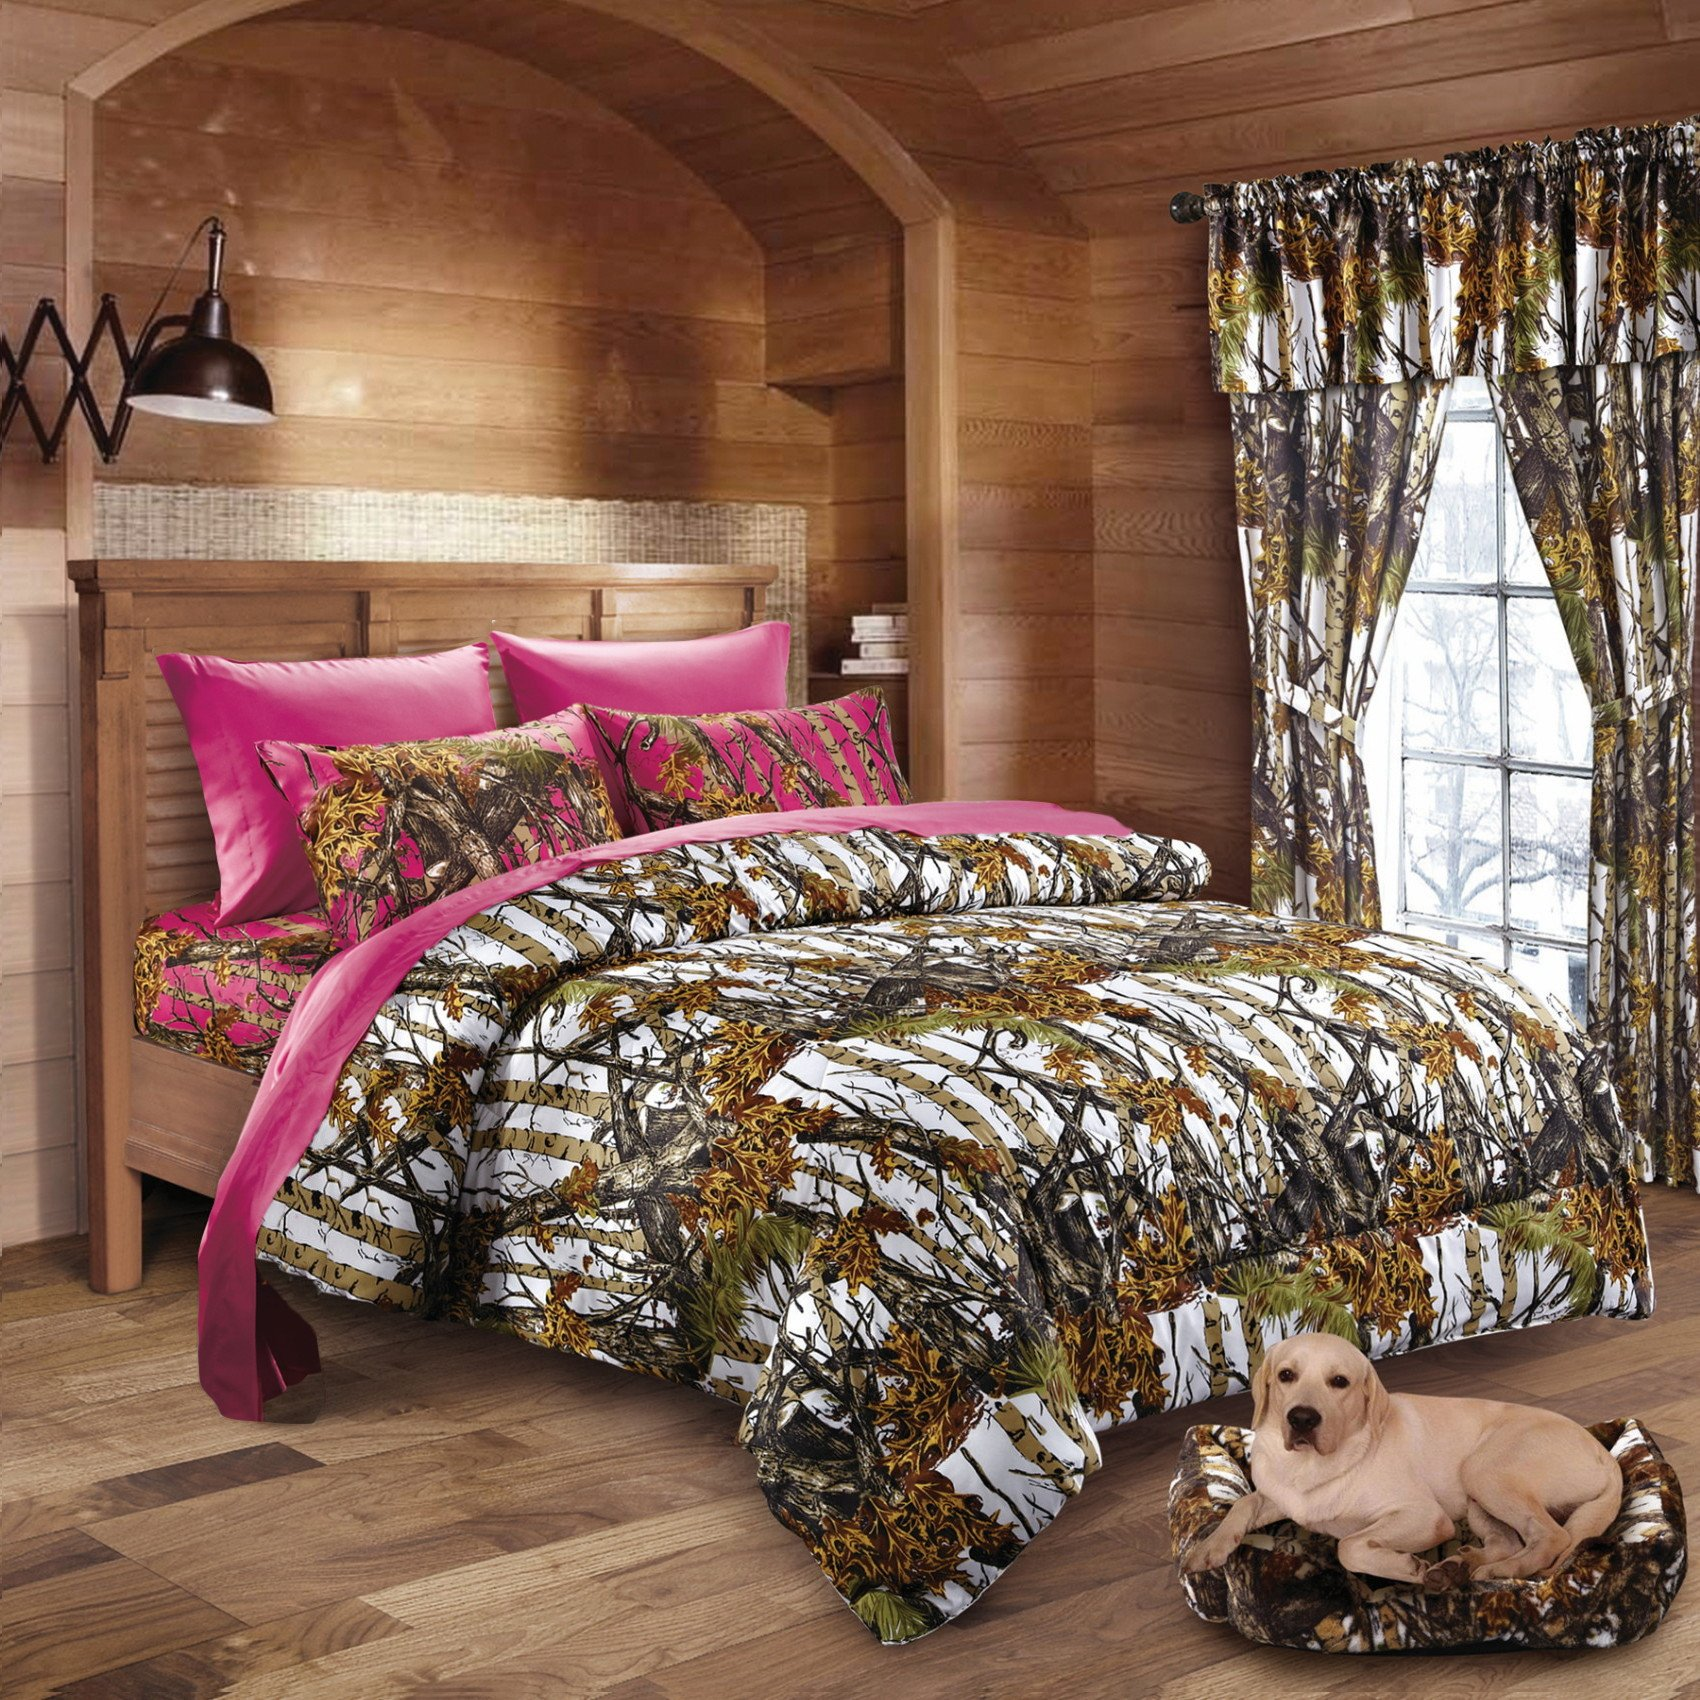 20 Lakes Hunter Camo Comforter, Sheet, Pillowcase Set White & Hot Pink (Twin, White & Hot Pink)